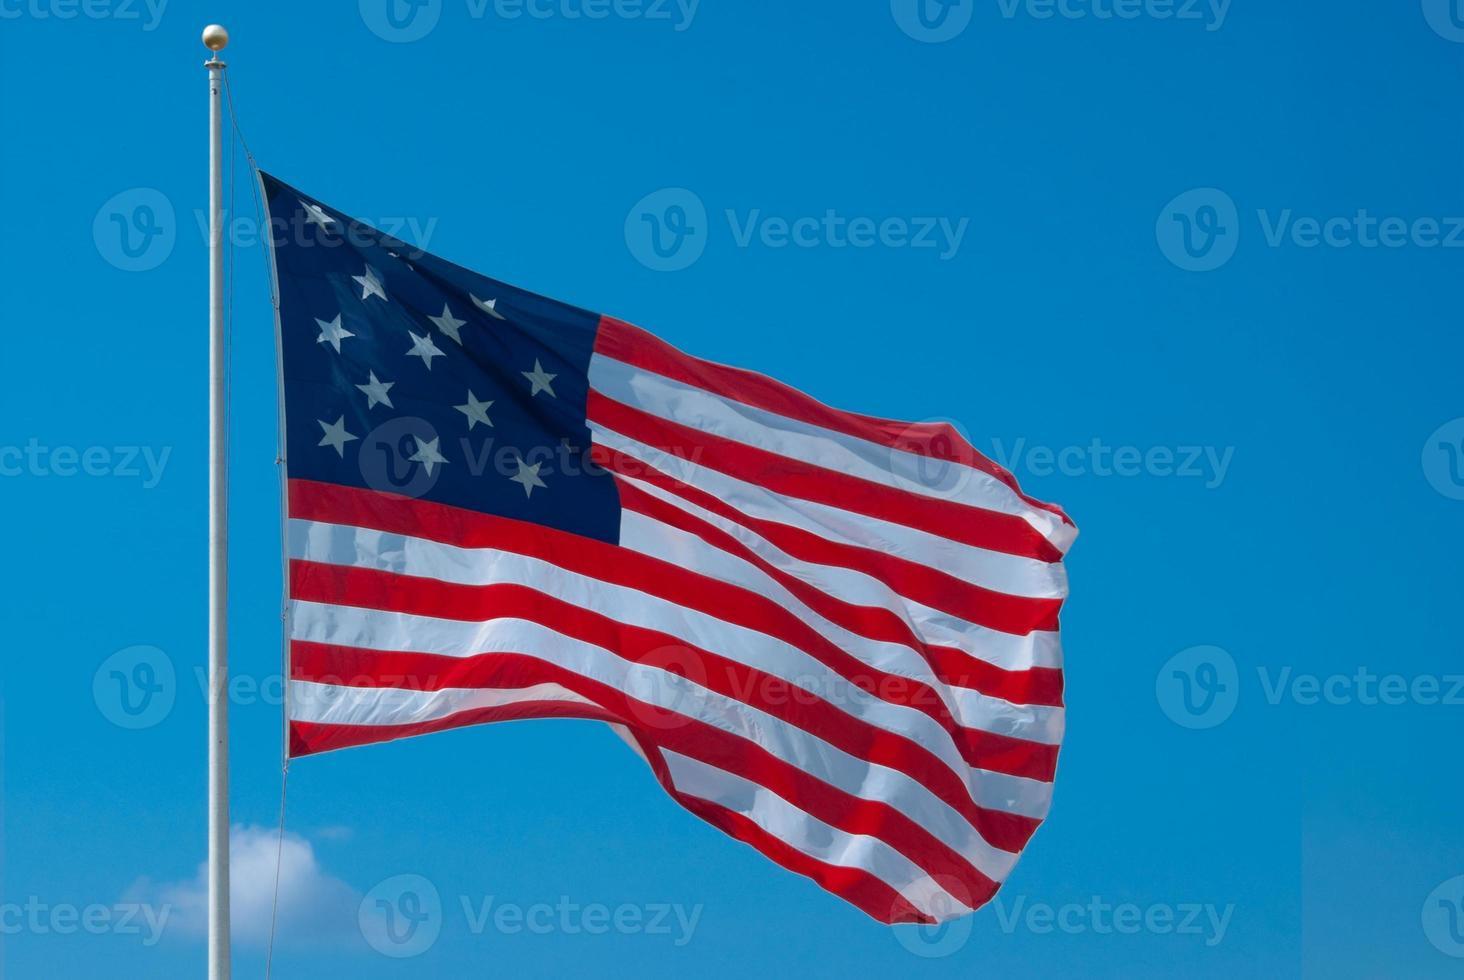 Die Sternenflagge - Baltimore, Maryland foto